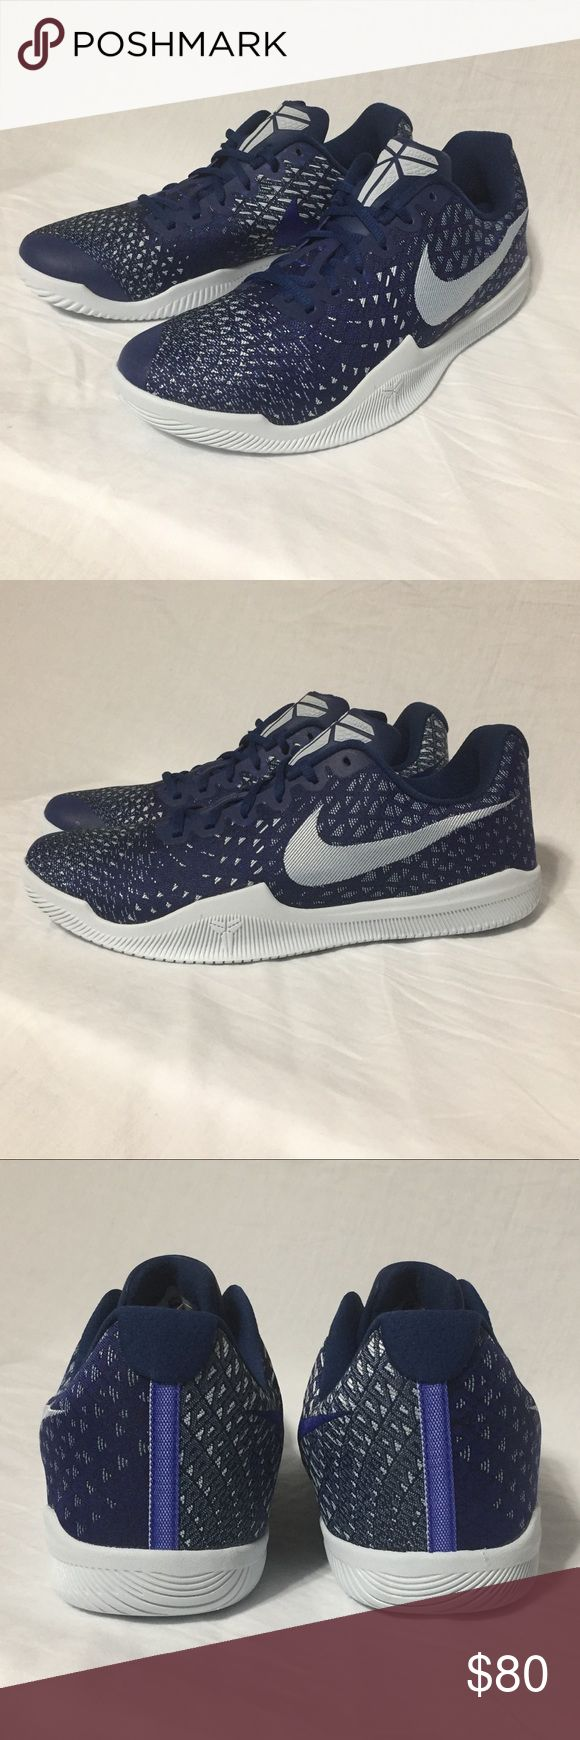 Nike Kobe Bryant Mamba Instinct Basketball Shoes Nike Kobe Bryant Mamba Instinct Basketball Shoes  Paramount Blue in color  Model # 852473 400  NEW with original box Nike Shoes Athletic Shoes